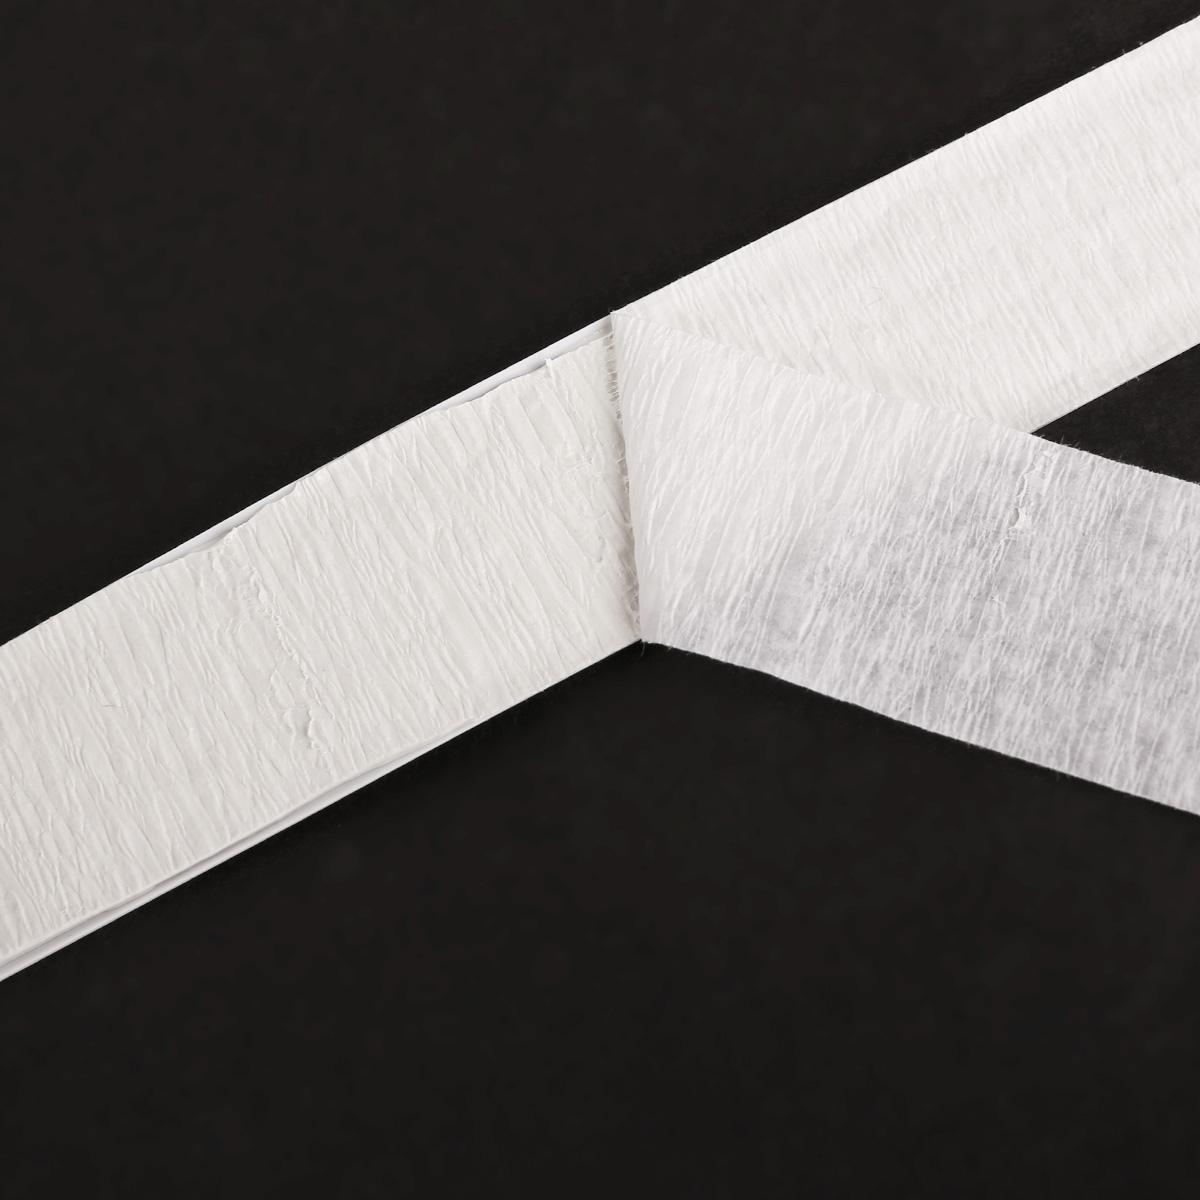 5m wannendichtband abdichtungsband dichtband fugenband f r badewannen dusche ebay. Black Bedroom Furniture Sets. Home Design Ideas